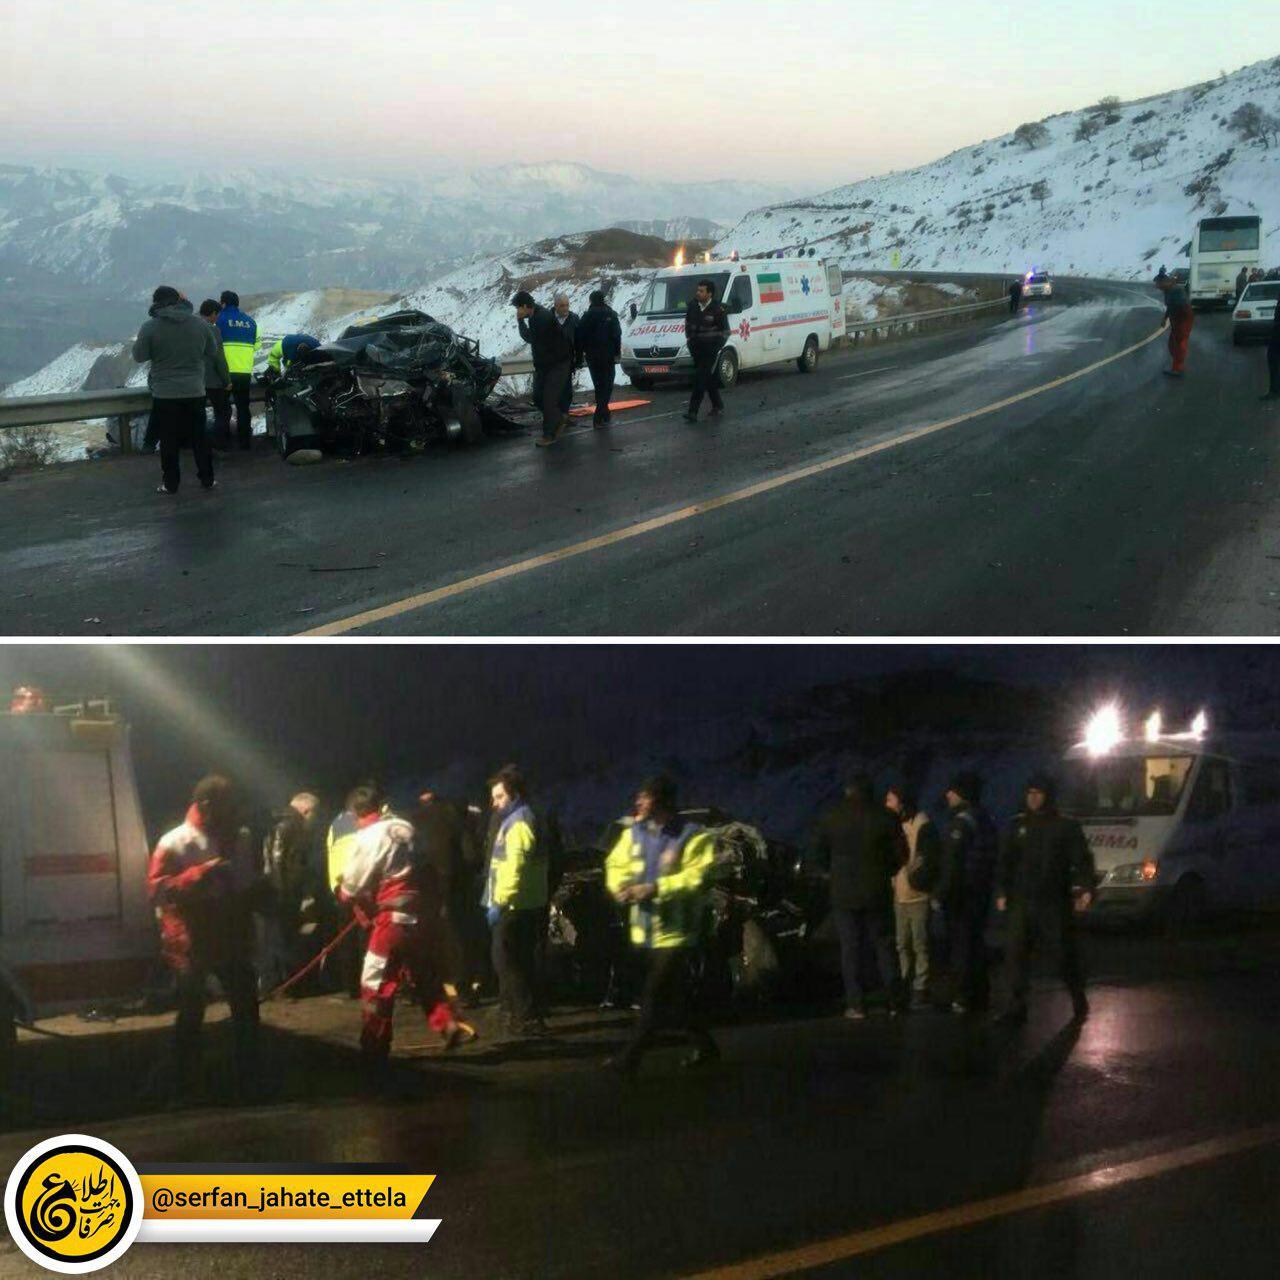 تصاویری از تصادف خودروی حامل صادق حضرتی